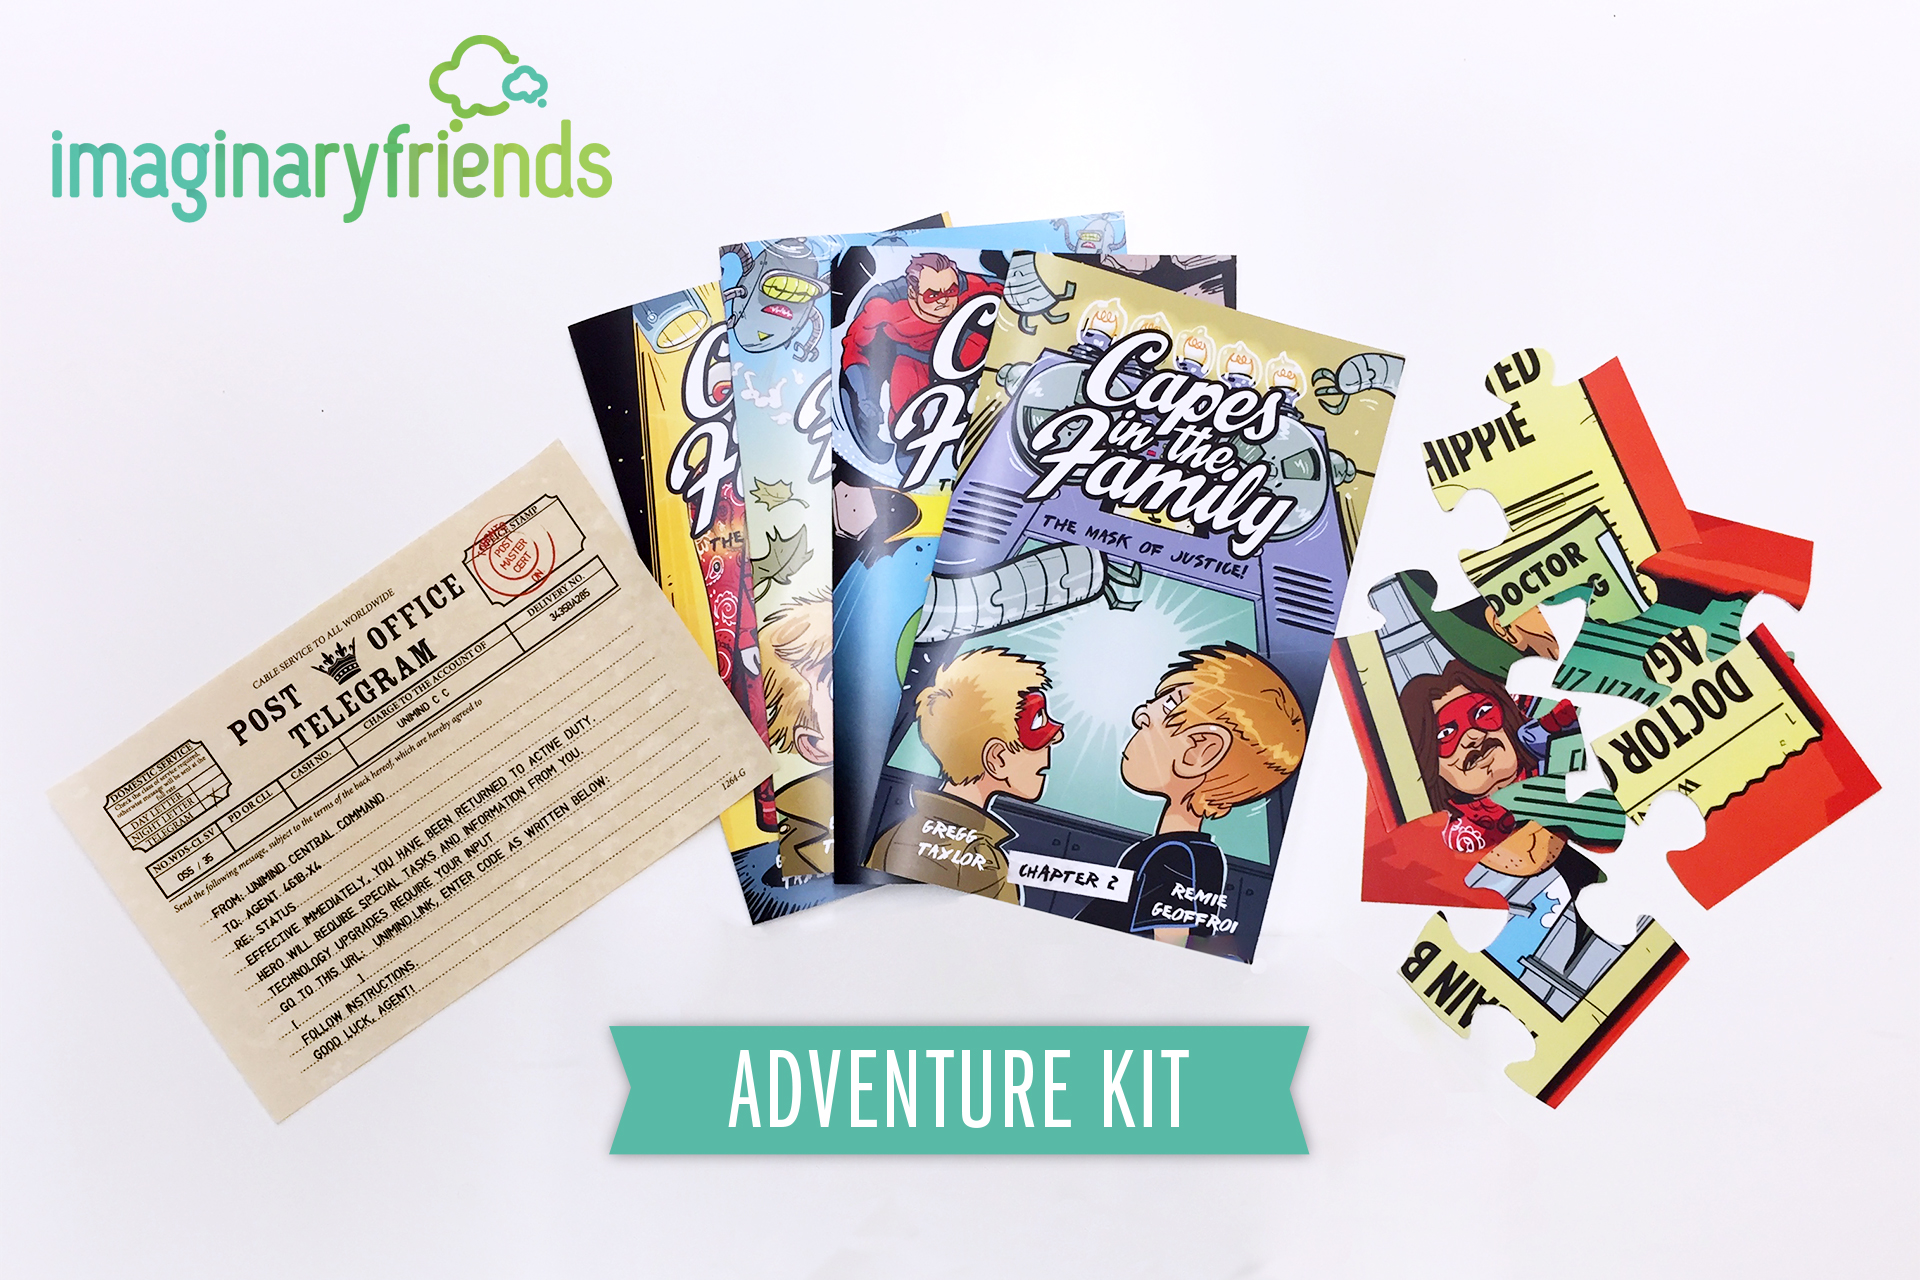 Support a #SocialforGood Entrepreneur – Help Bring #ImaginaryFriends  @IFBooks to Market on #Kickstarter